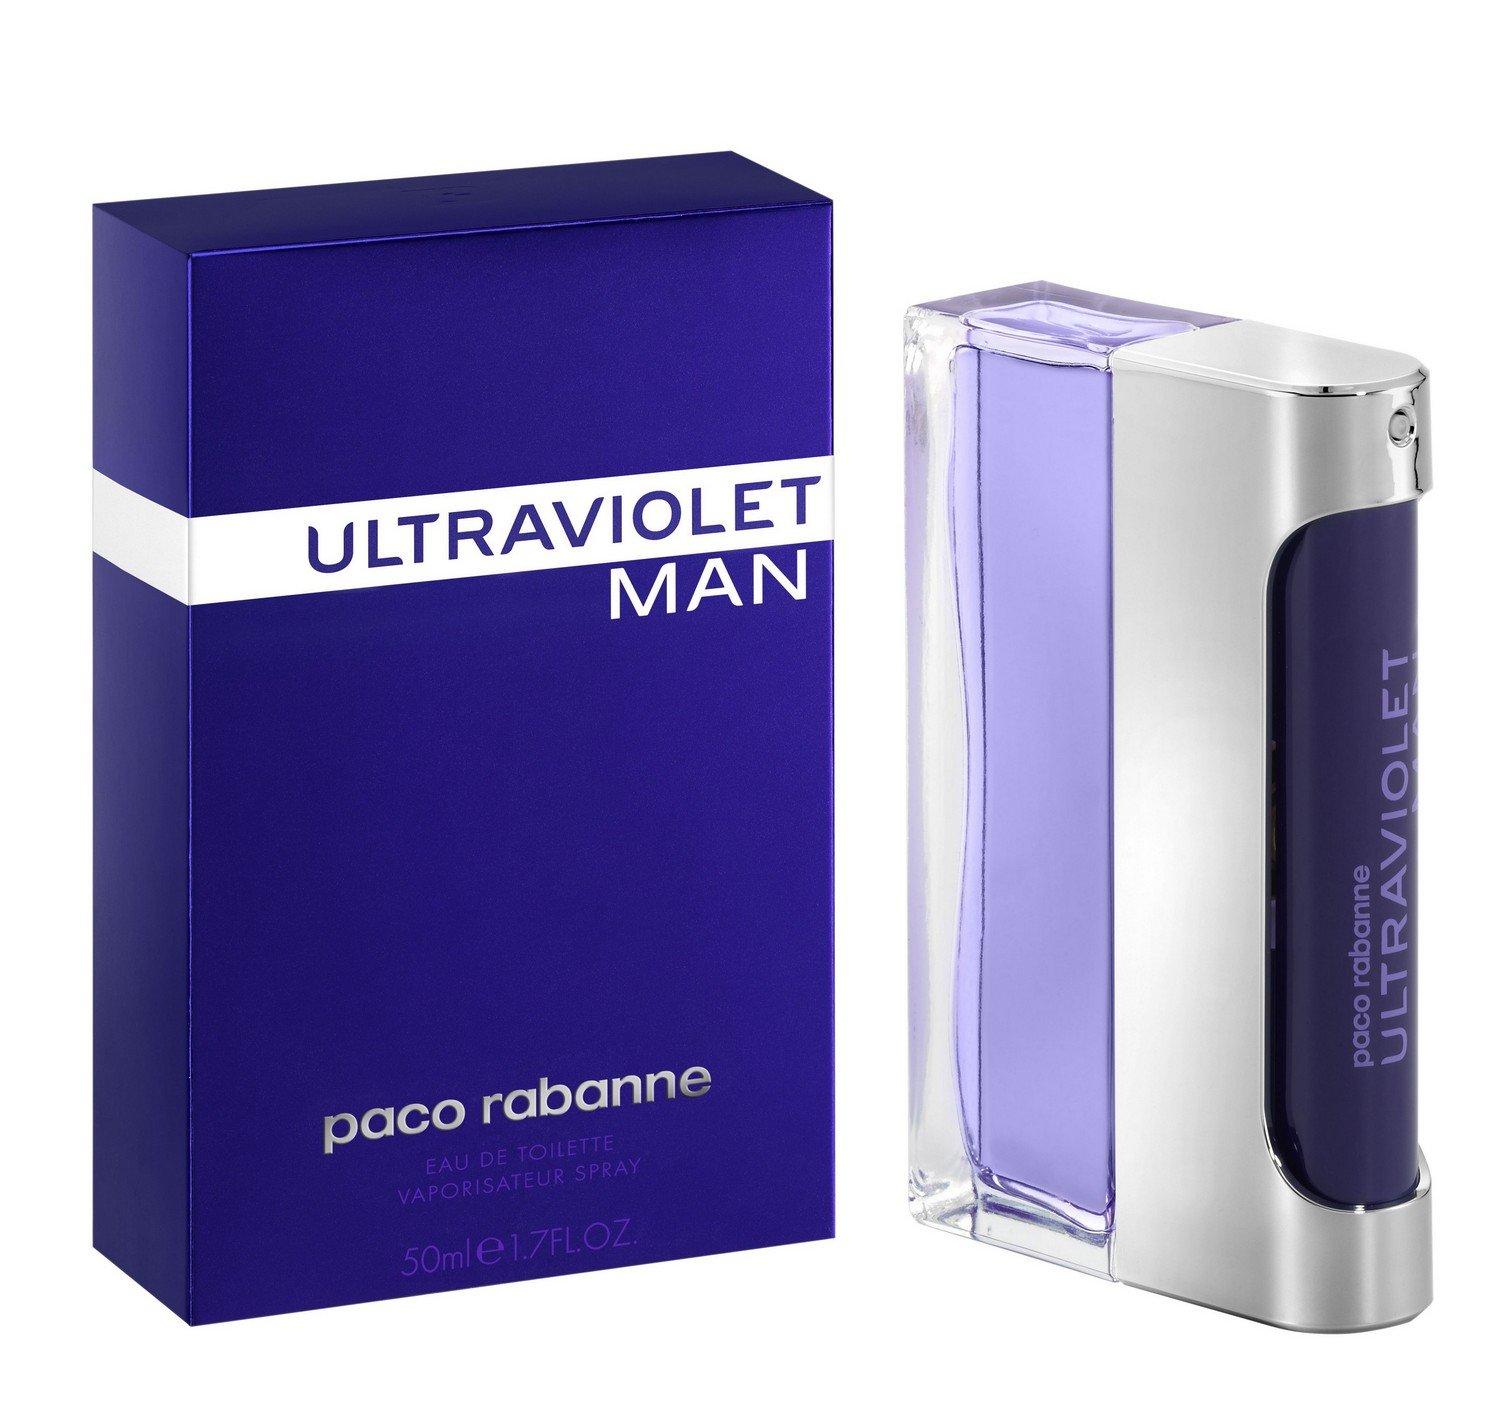 Vapo Edt Paco Man Rabanne Ultraviolet 50ml q5R3AjLSc4